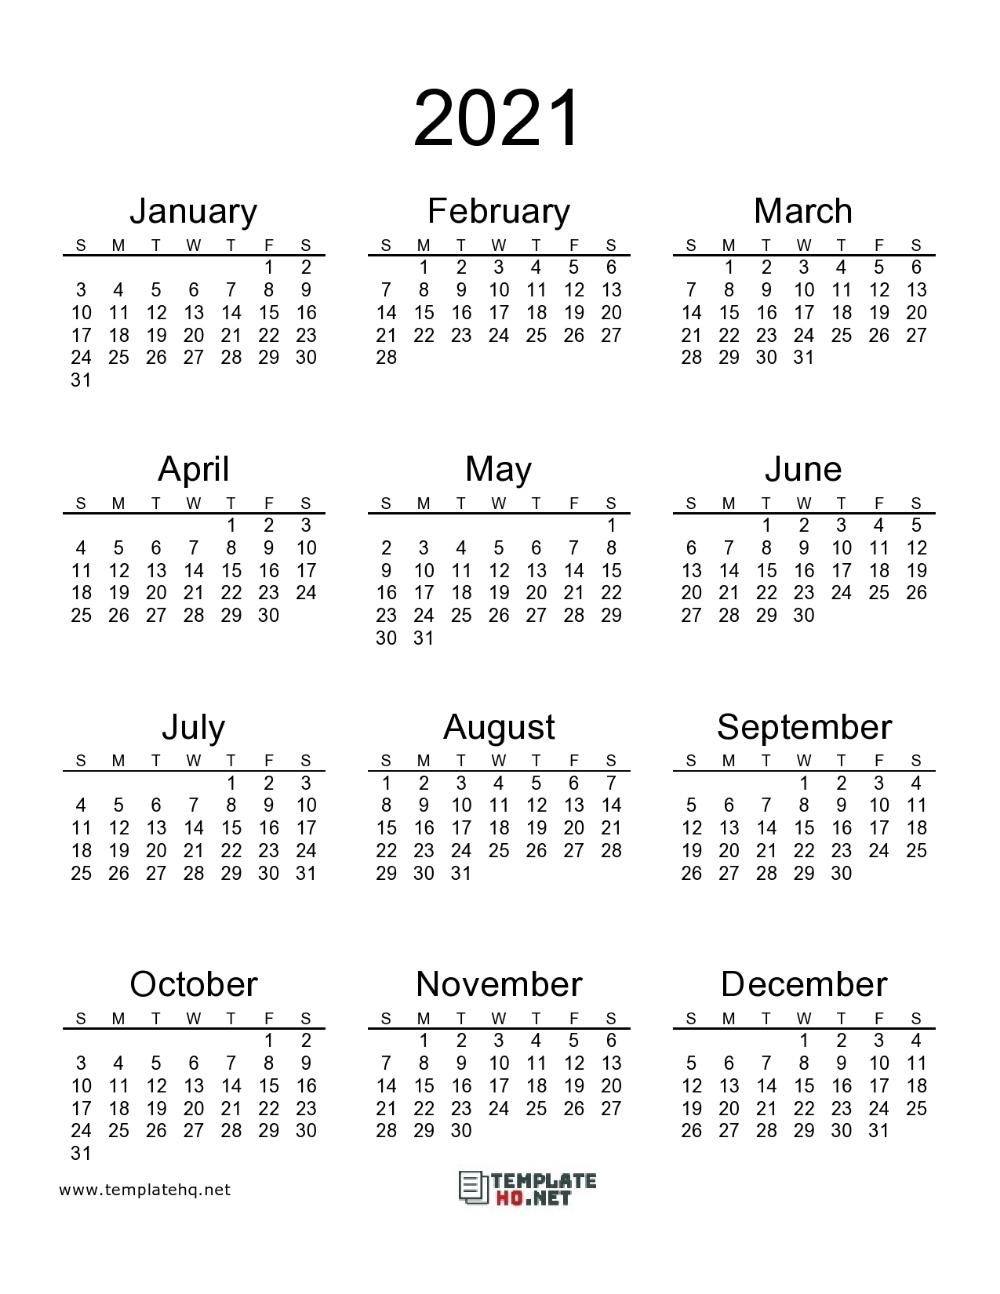 2021 Calendar Printable 00 In 2020 | Calendar Printables